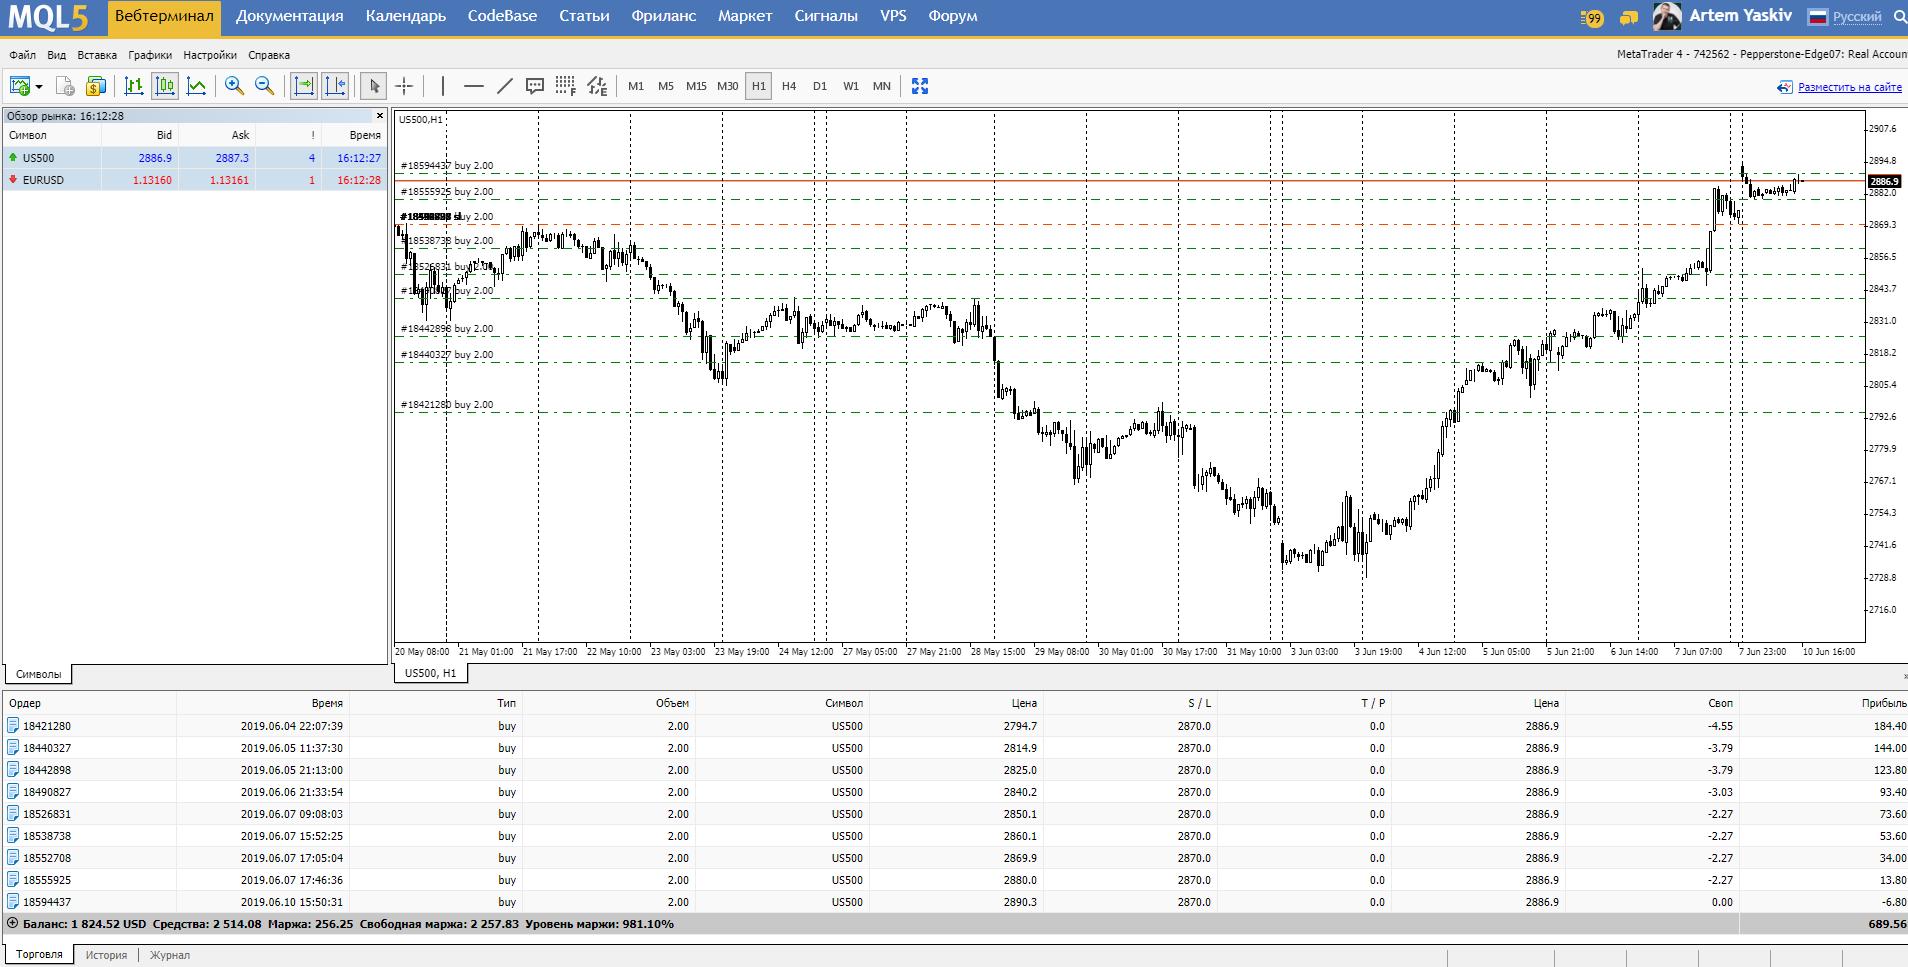 Набор позиций по S&P500